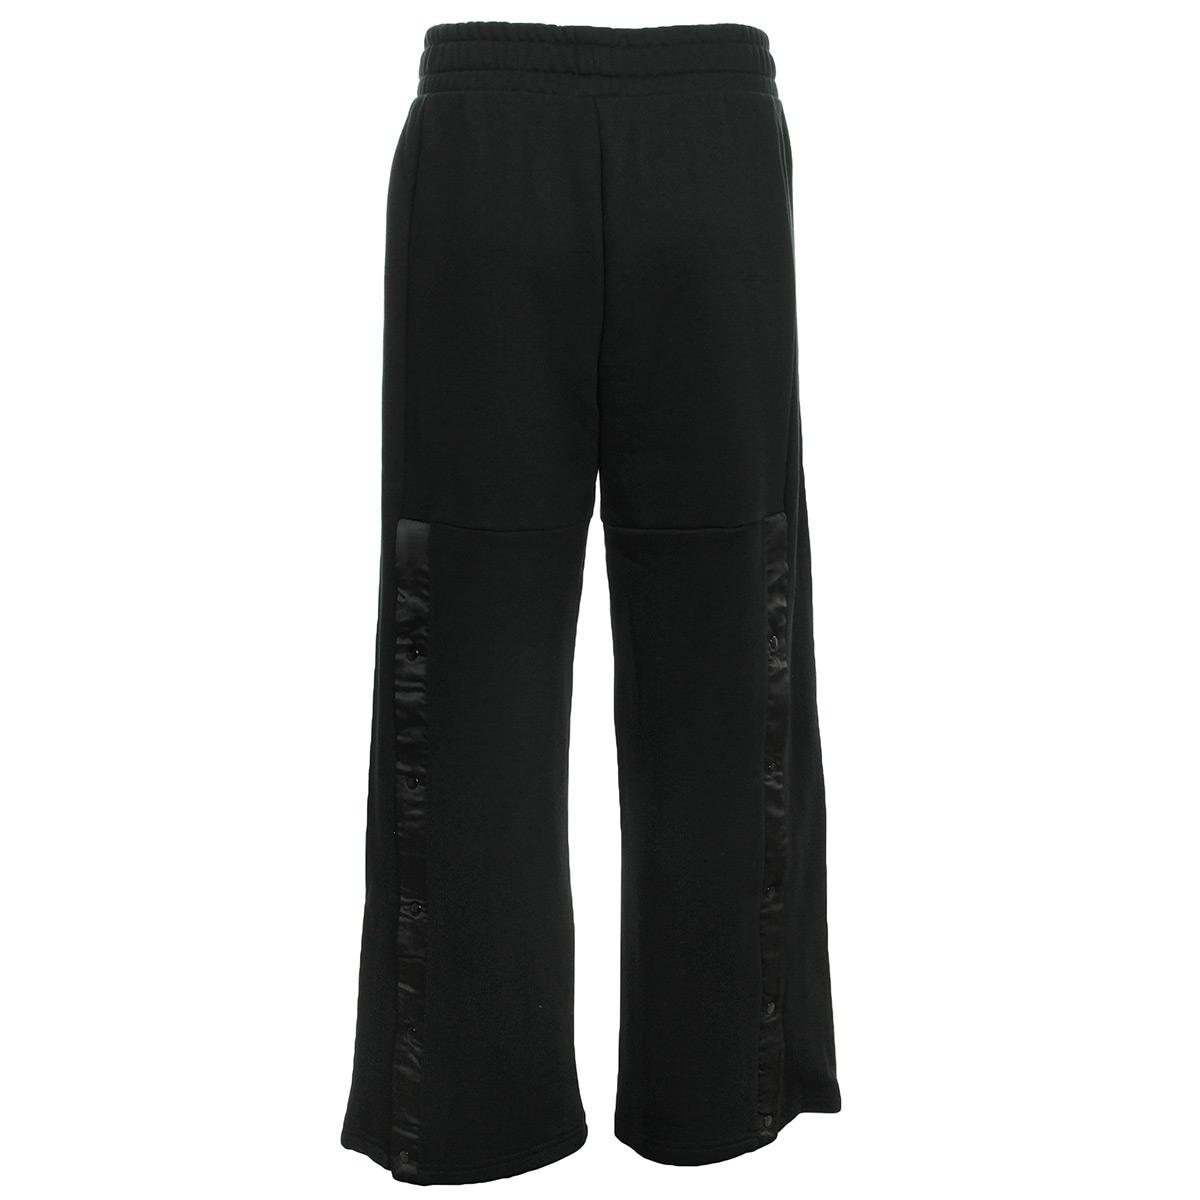 Puma Pop Up Pants 57548401, Pantalons femme